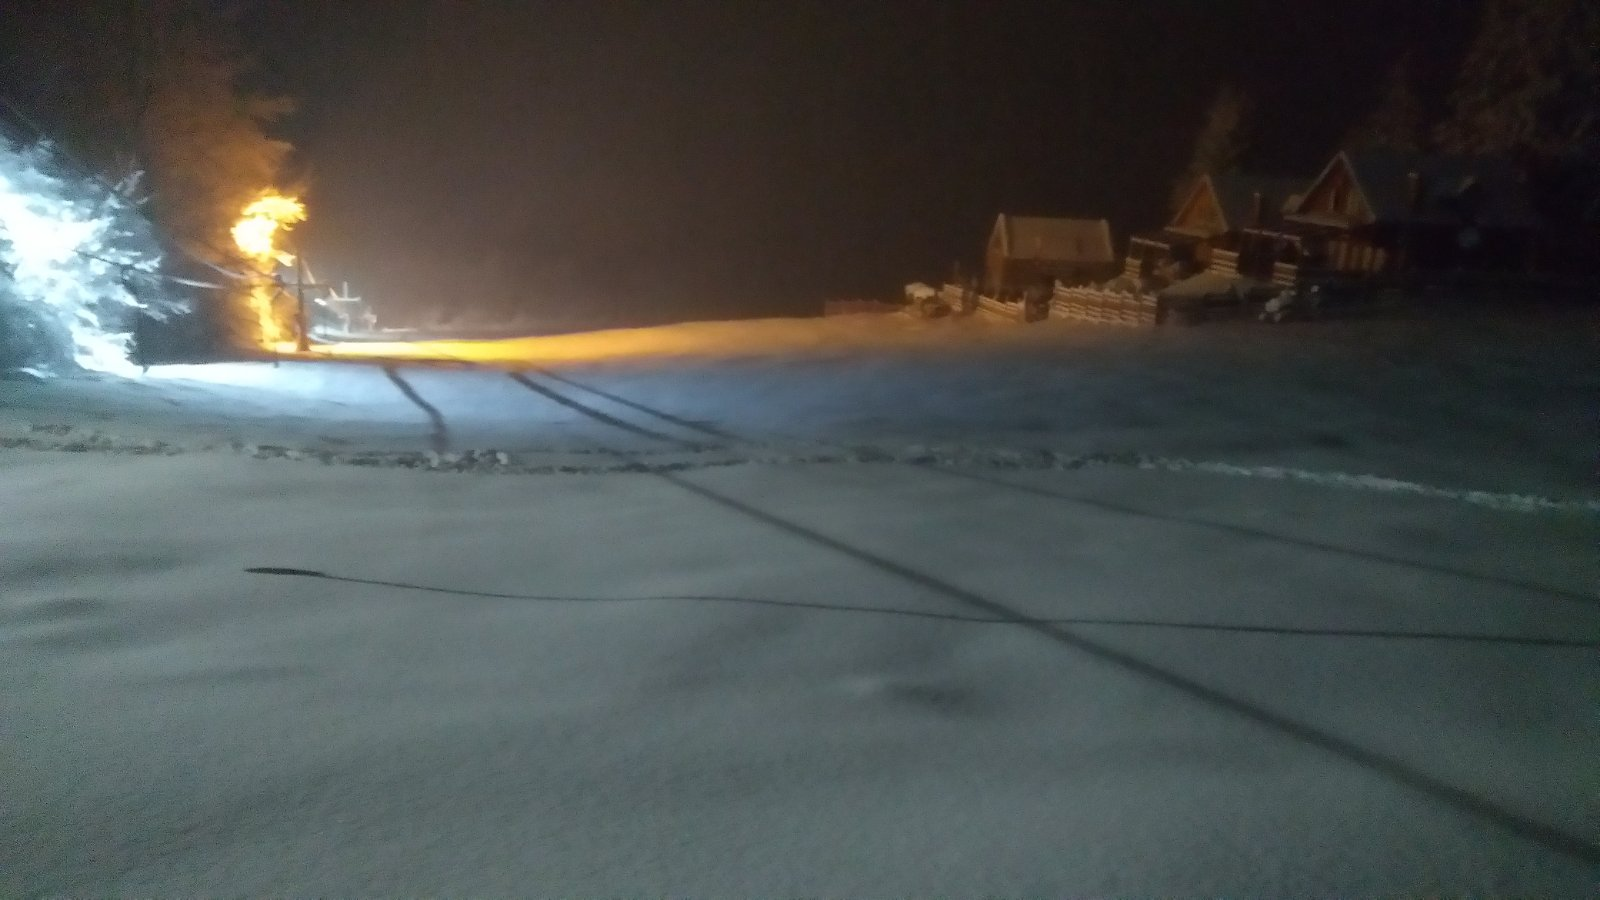 Photo of Planinarski dom: Palo skoro 20 centimetara snega. Startuje škola skijanja za sve mališane